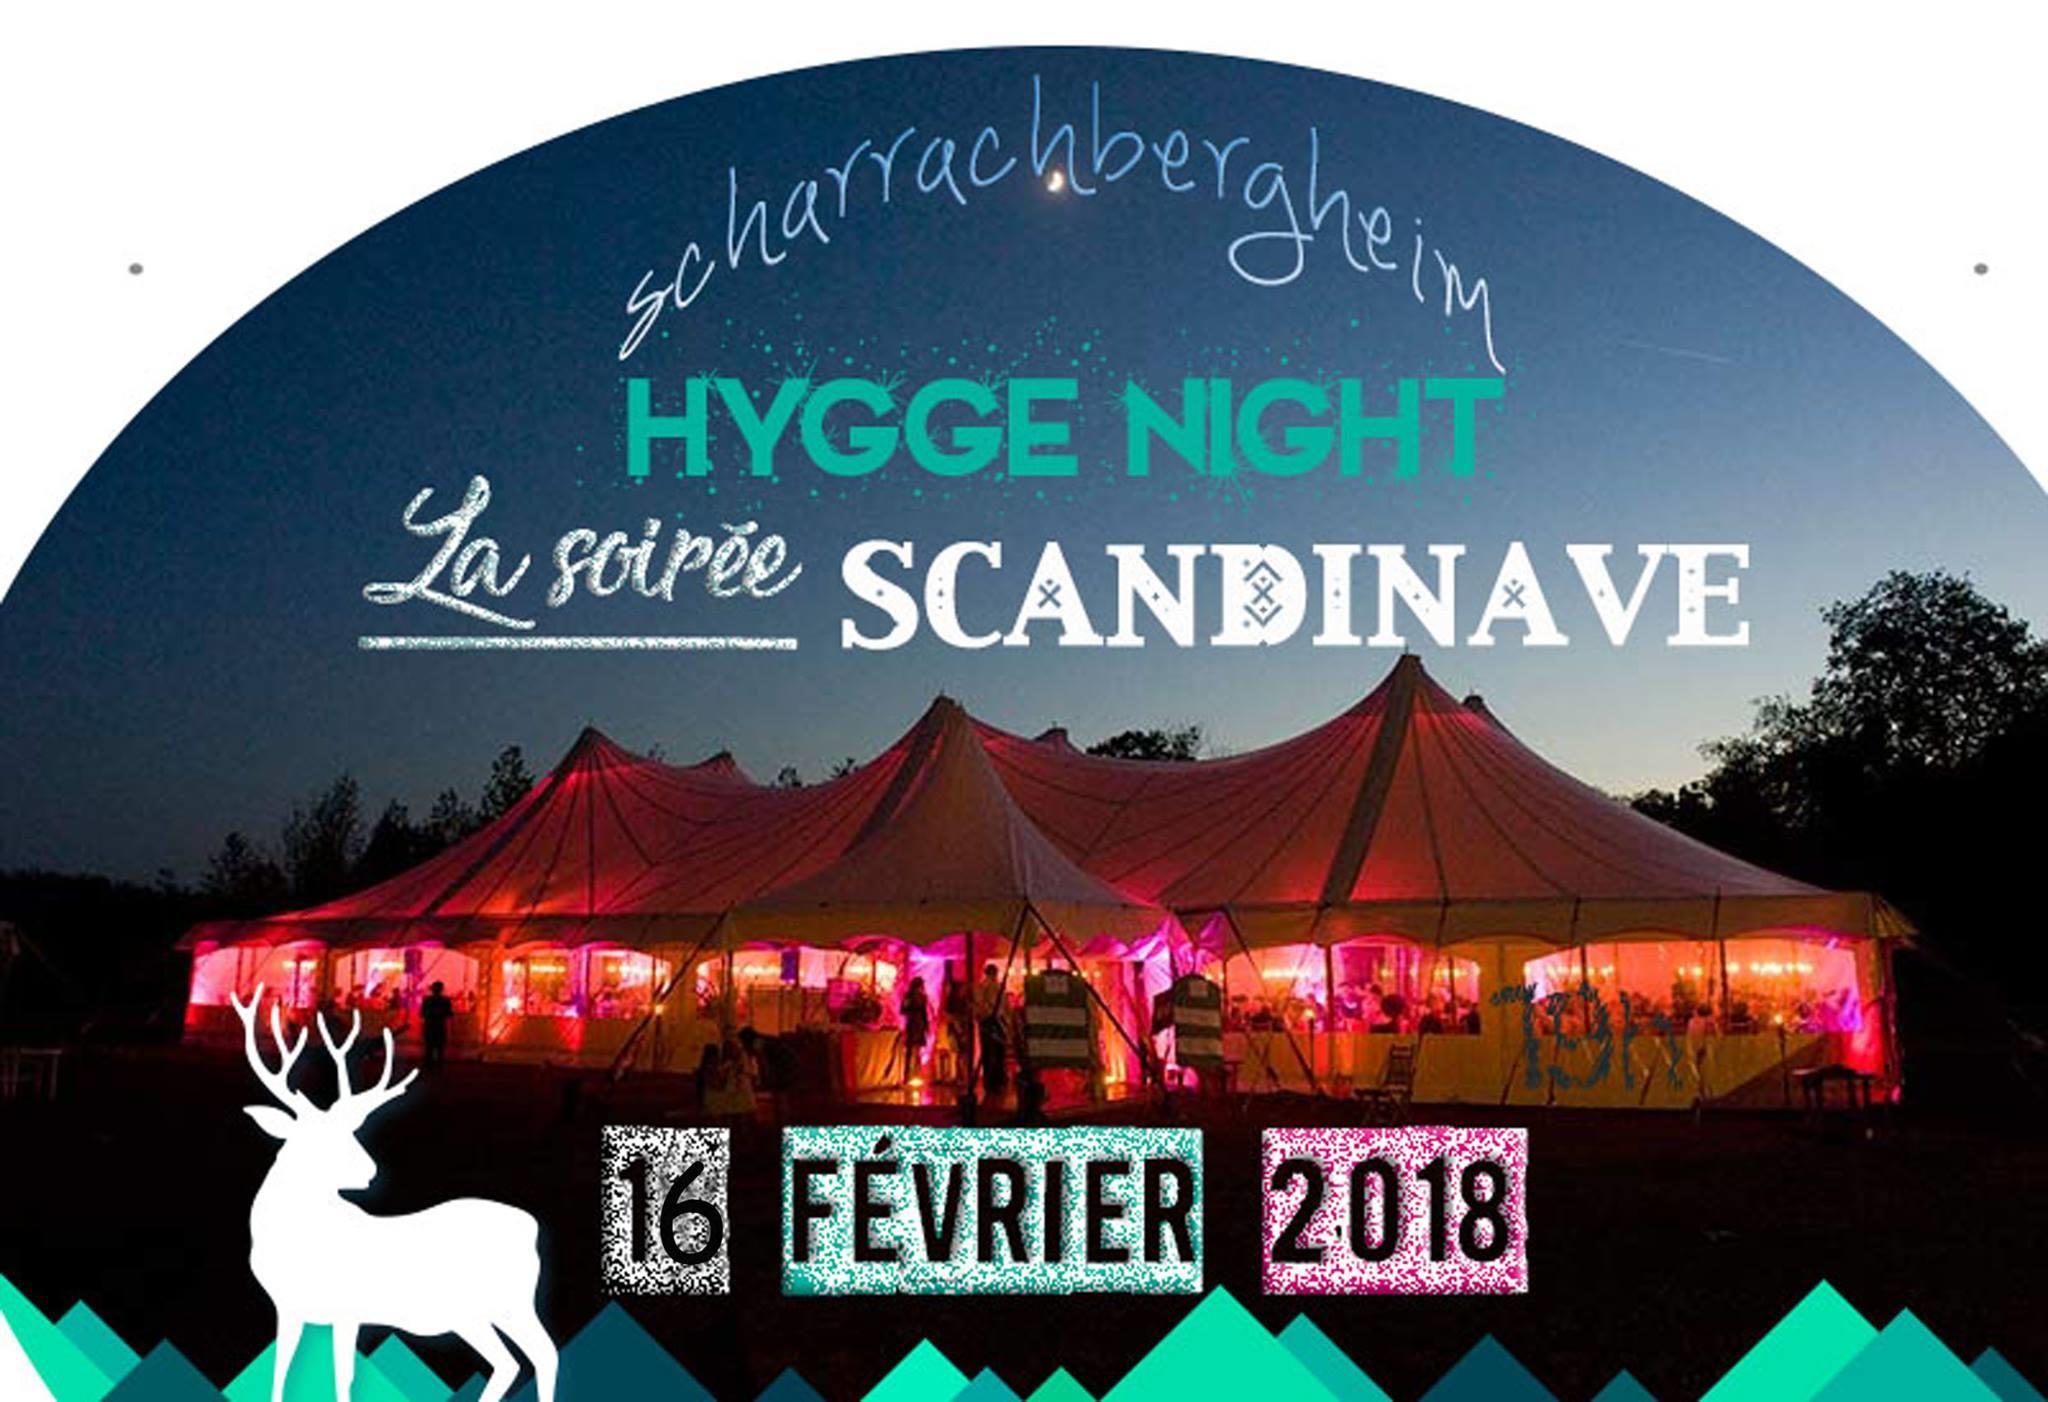 Hygge night - soirée scandinave